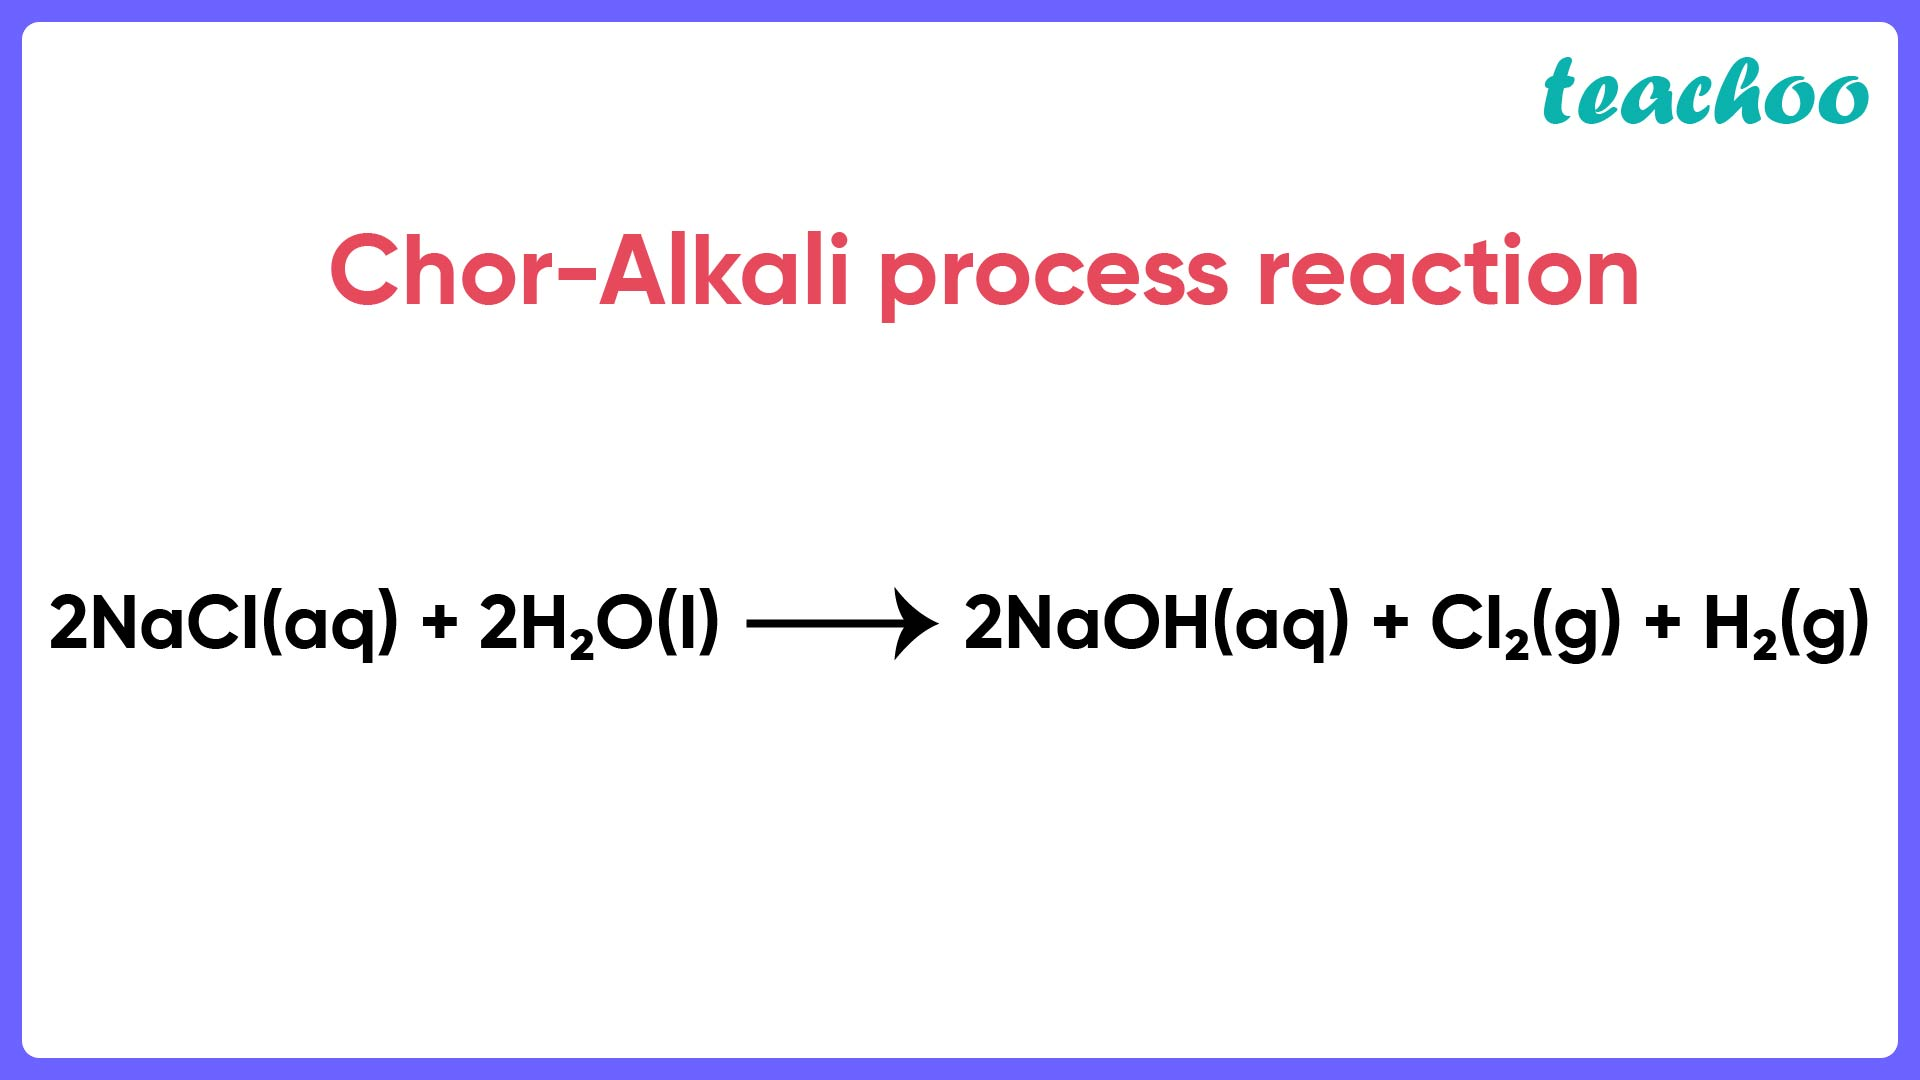 Chor-Alkali process reaction - Teachoo.jpg